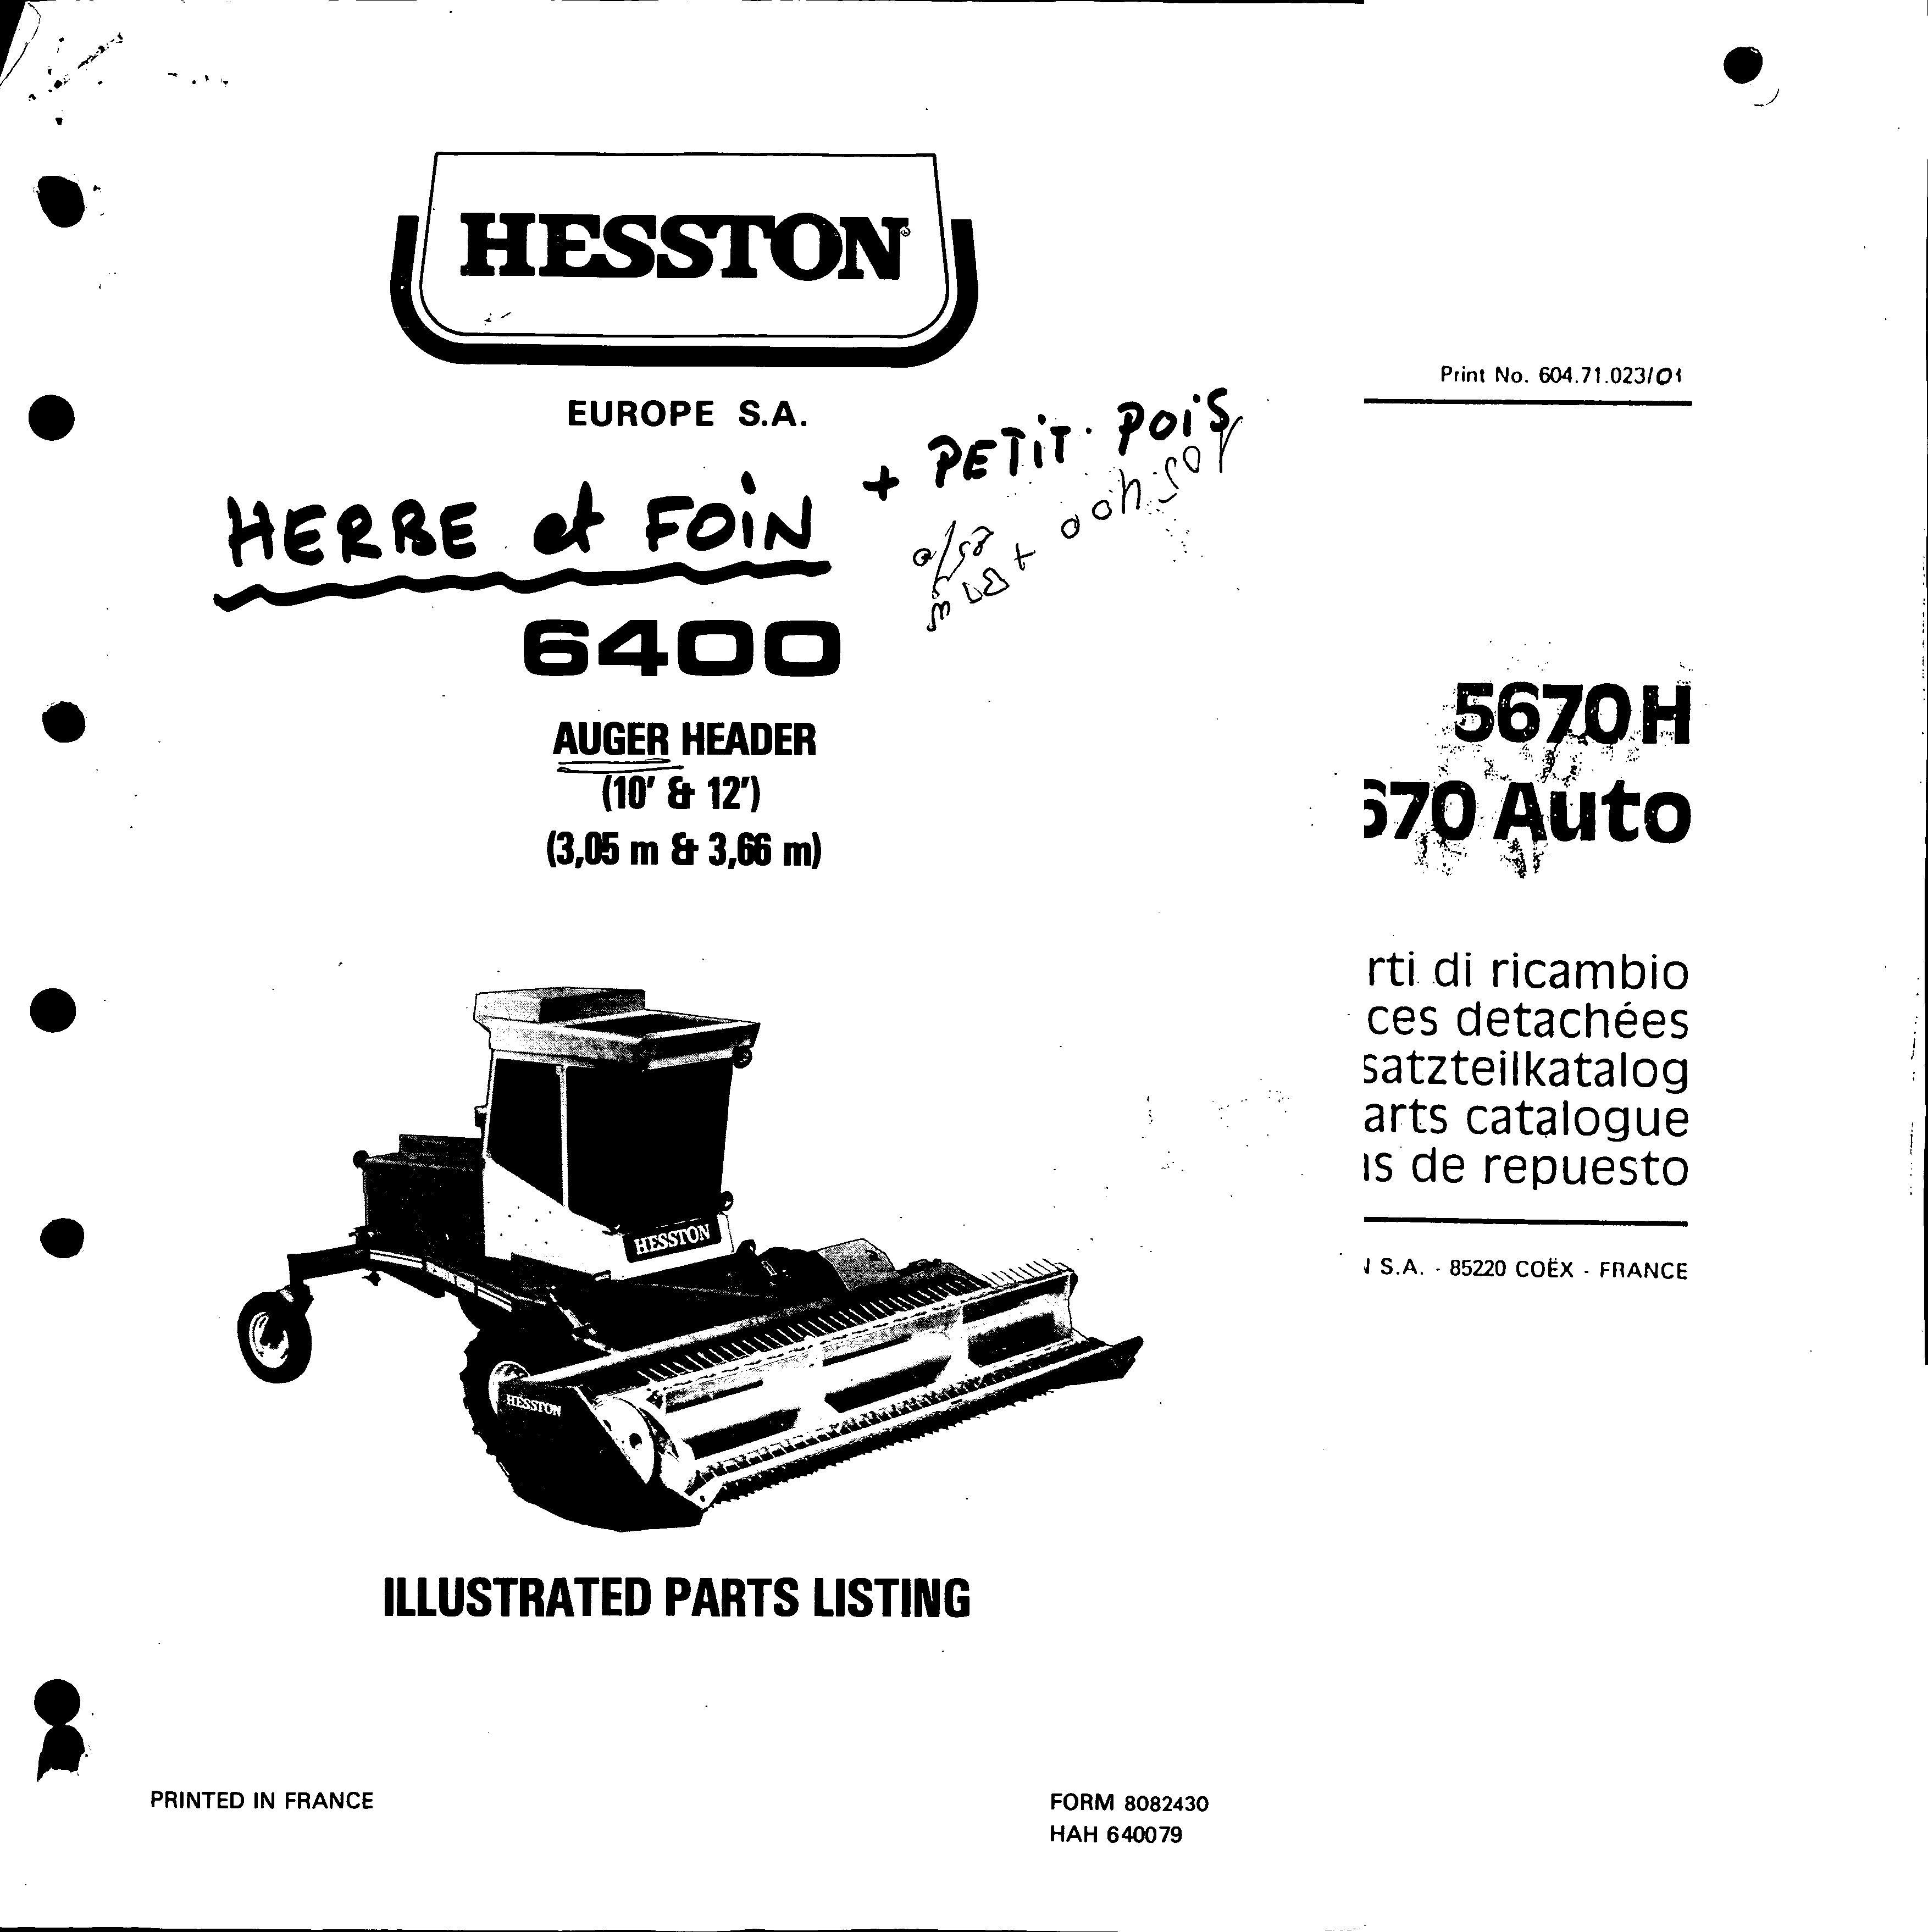 Hesston Auger Header Service Parts Catalogue Download